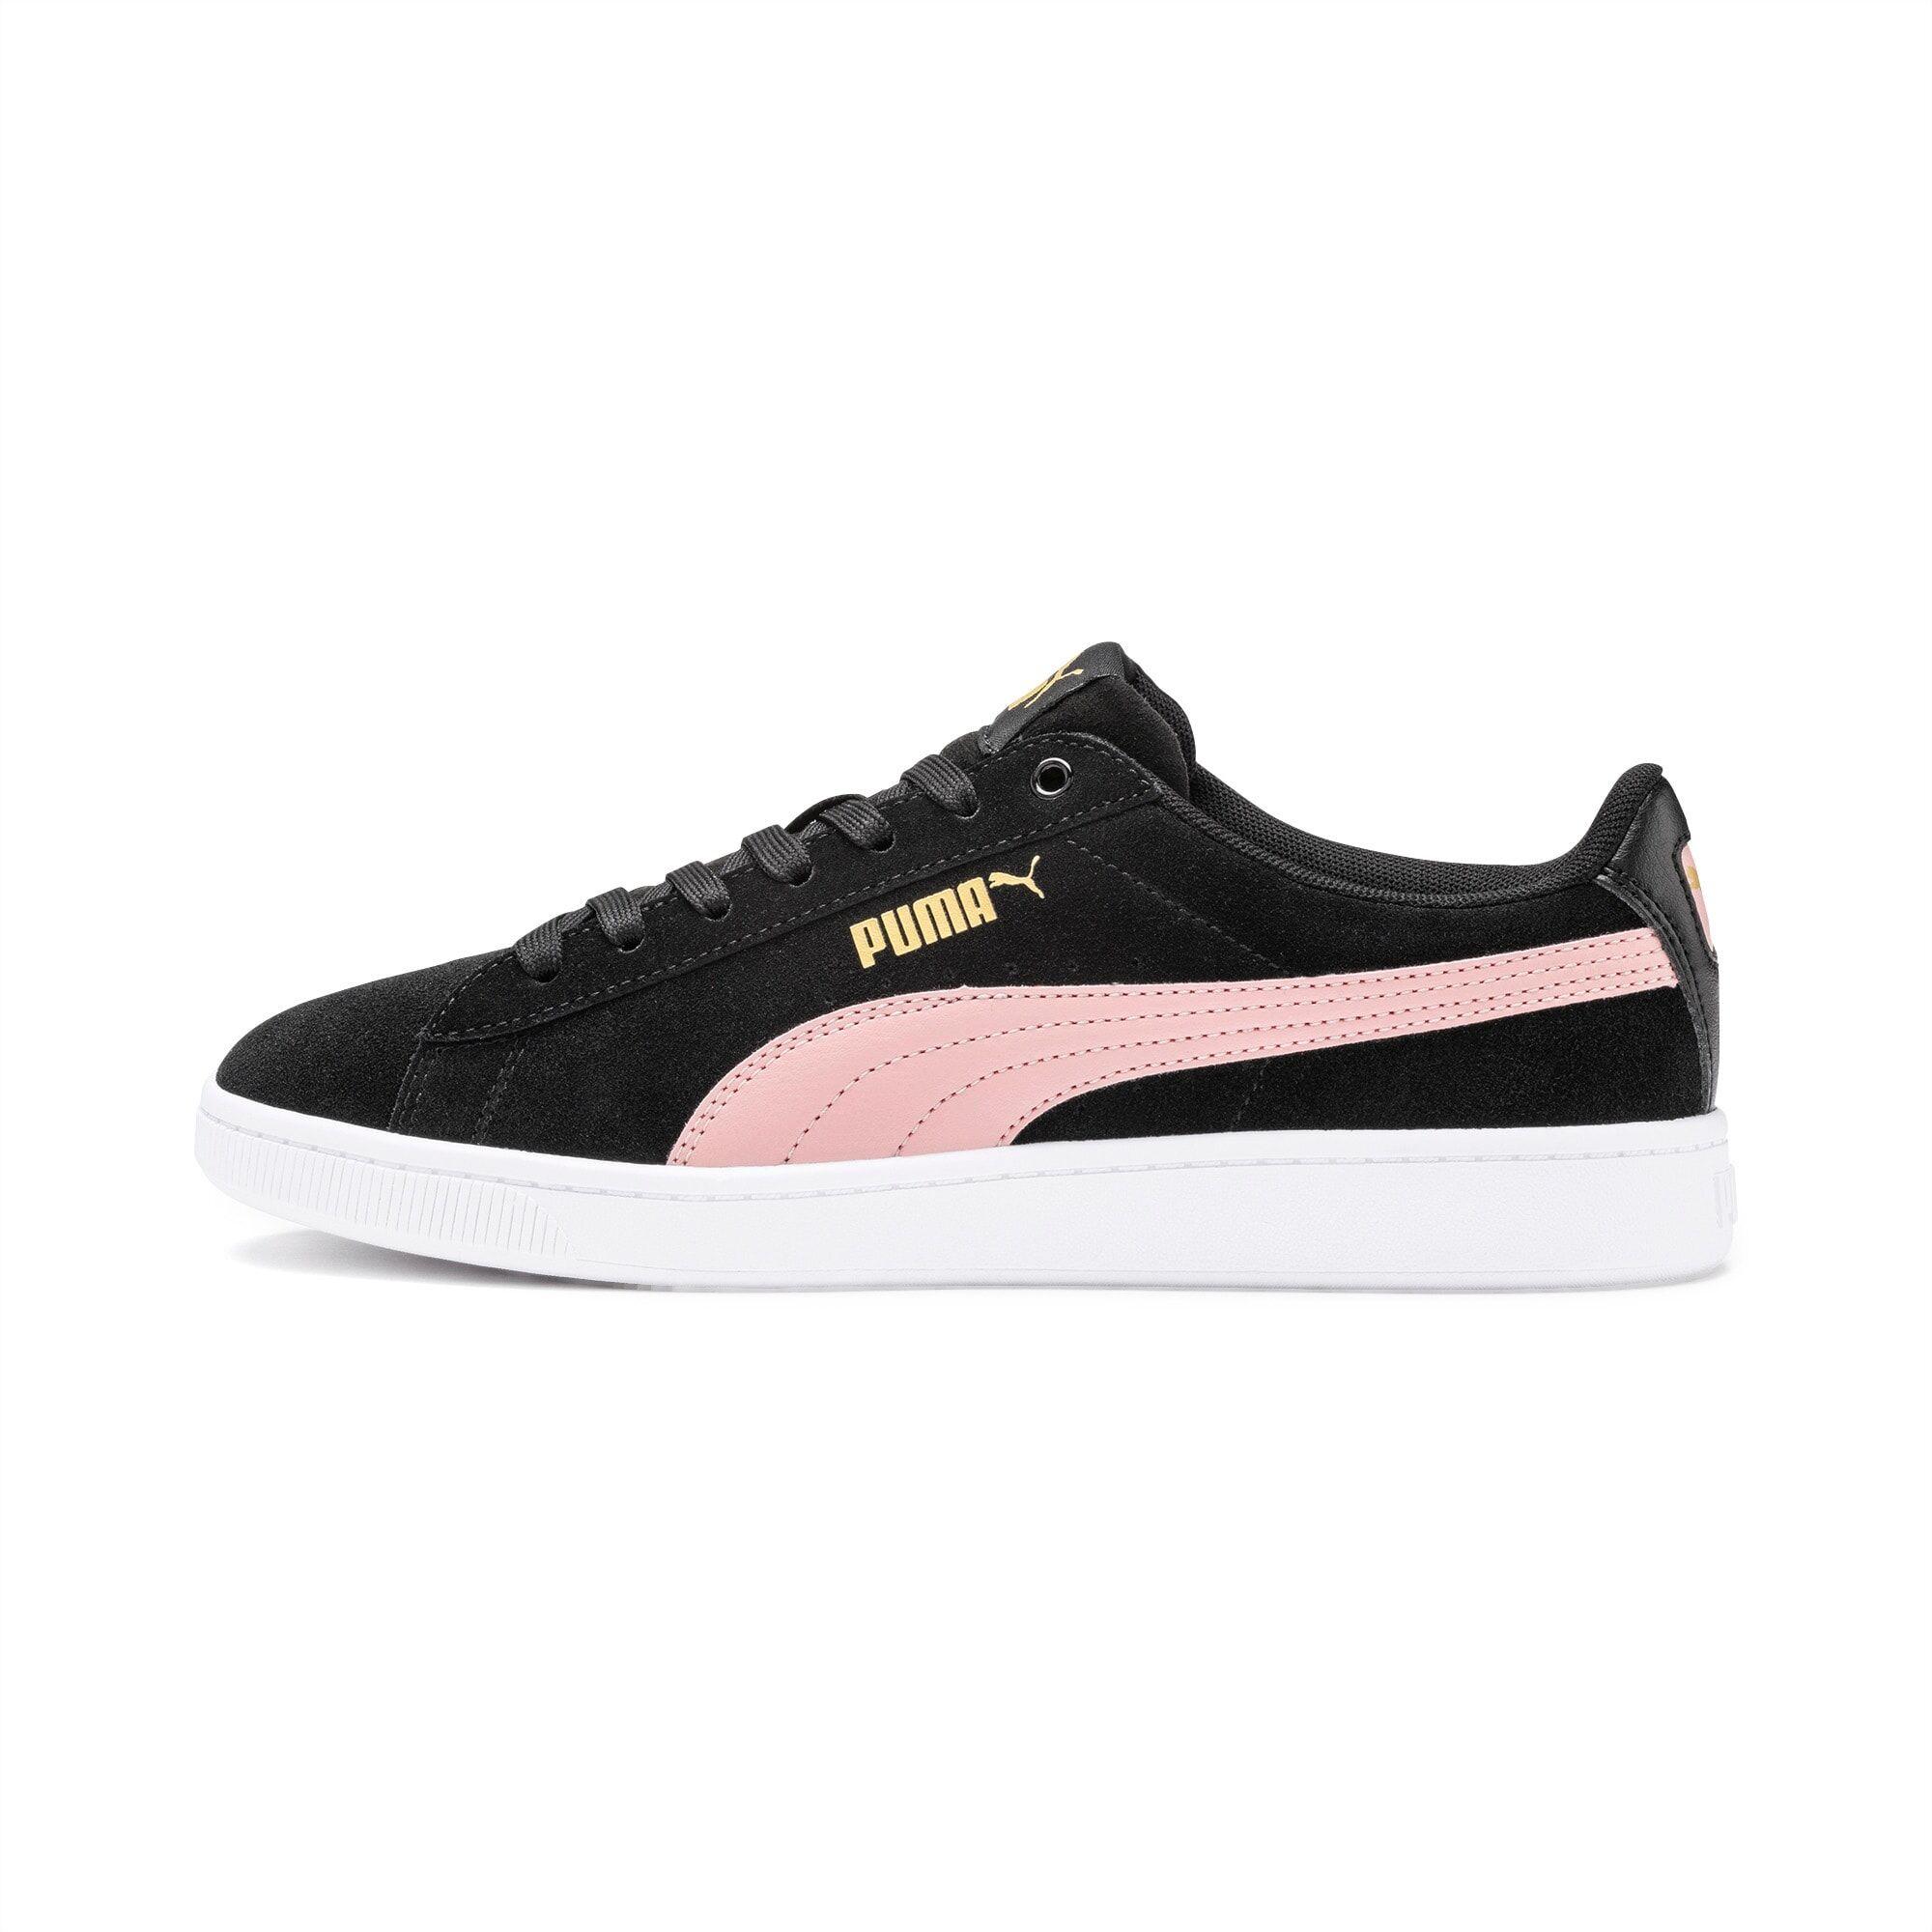 PUMA Chaussure Basket Vikky v2 pour Femme, Blanc/Rose/Noir, Taille 36, Chaussures